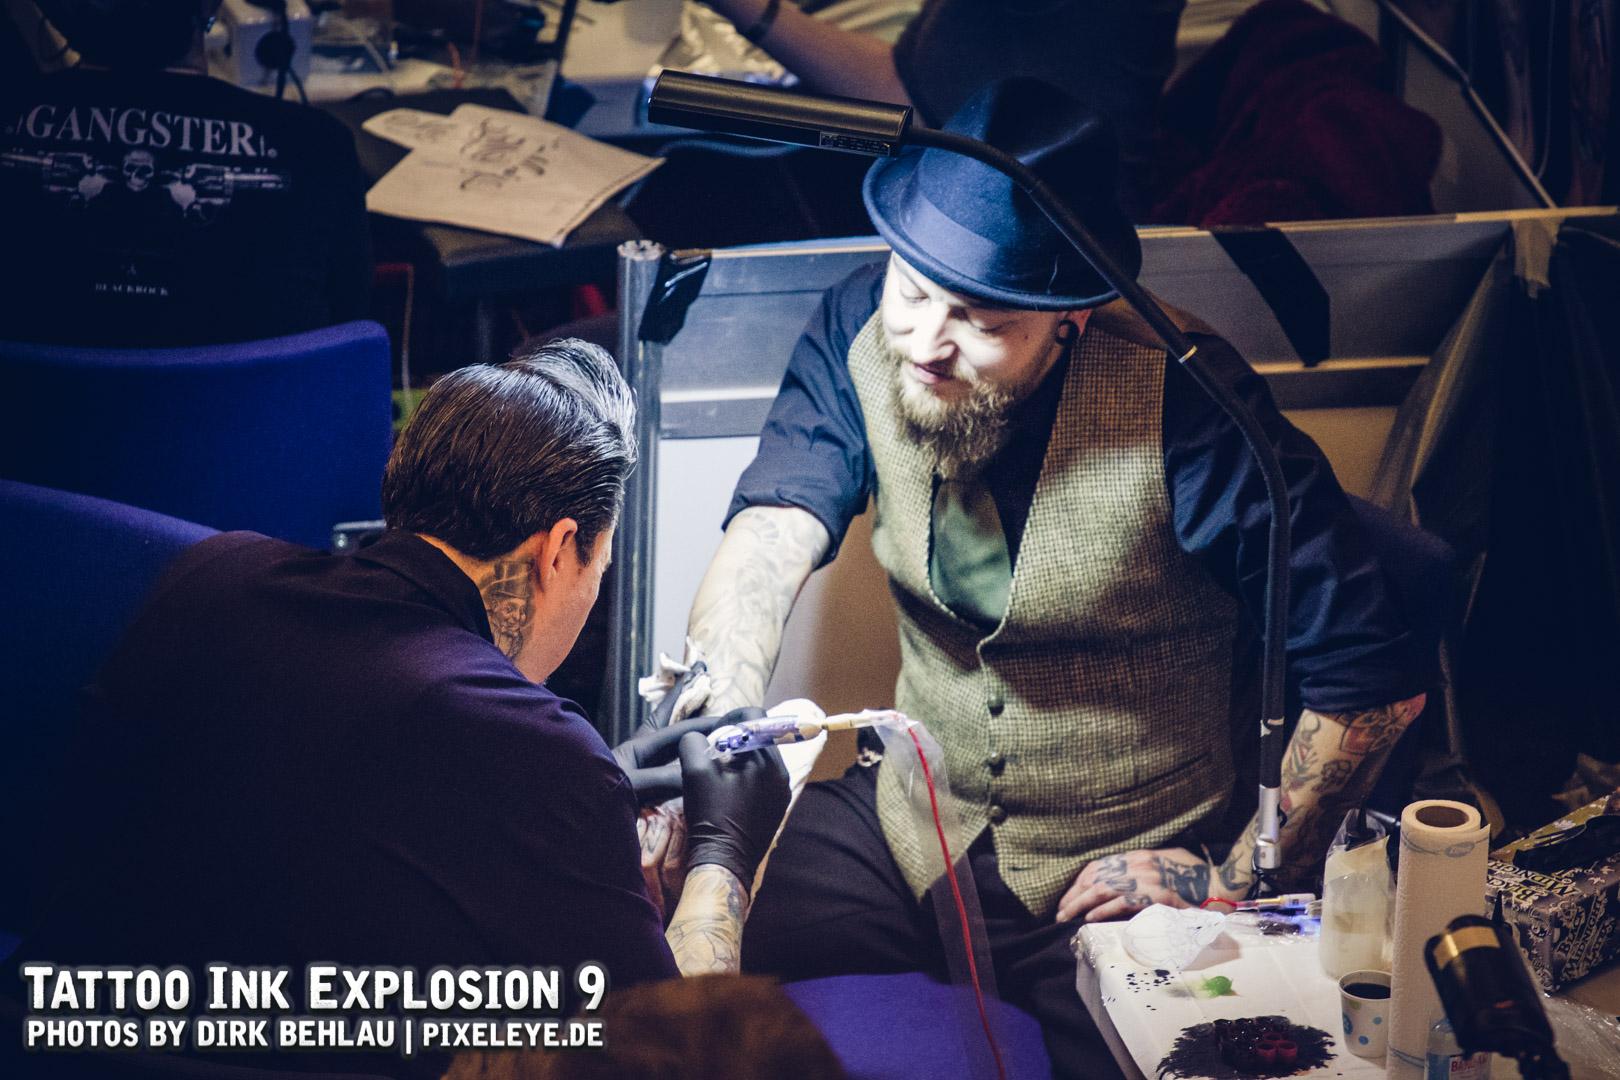 Tattoo Ink Explosion 2018 WEB by Dirk Behlau-1412.jpg